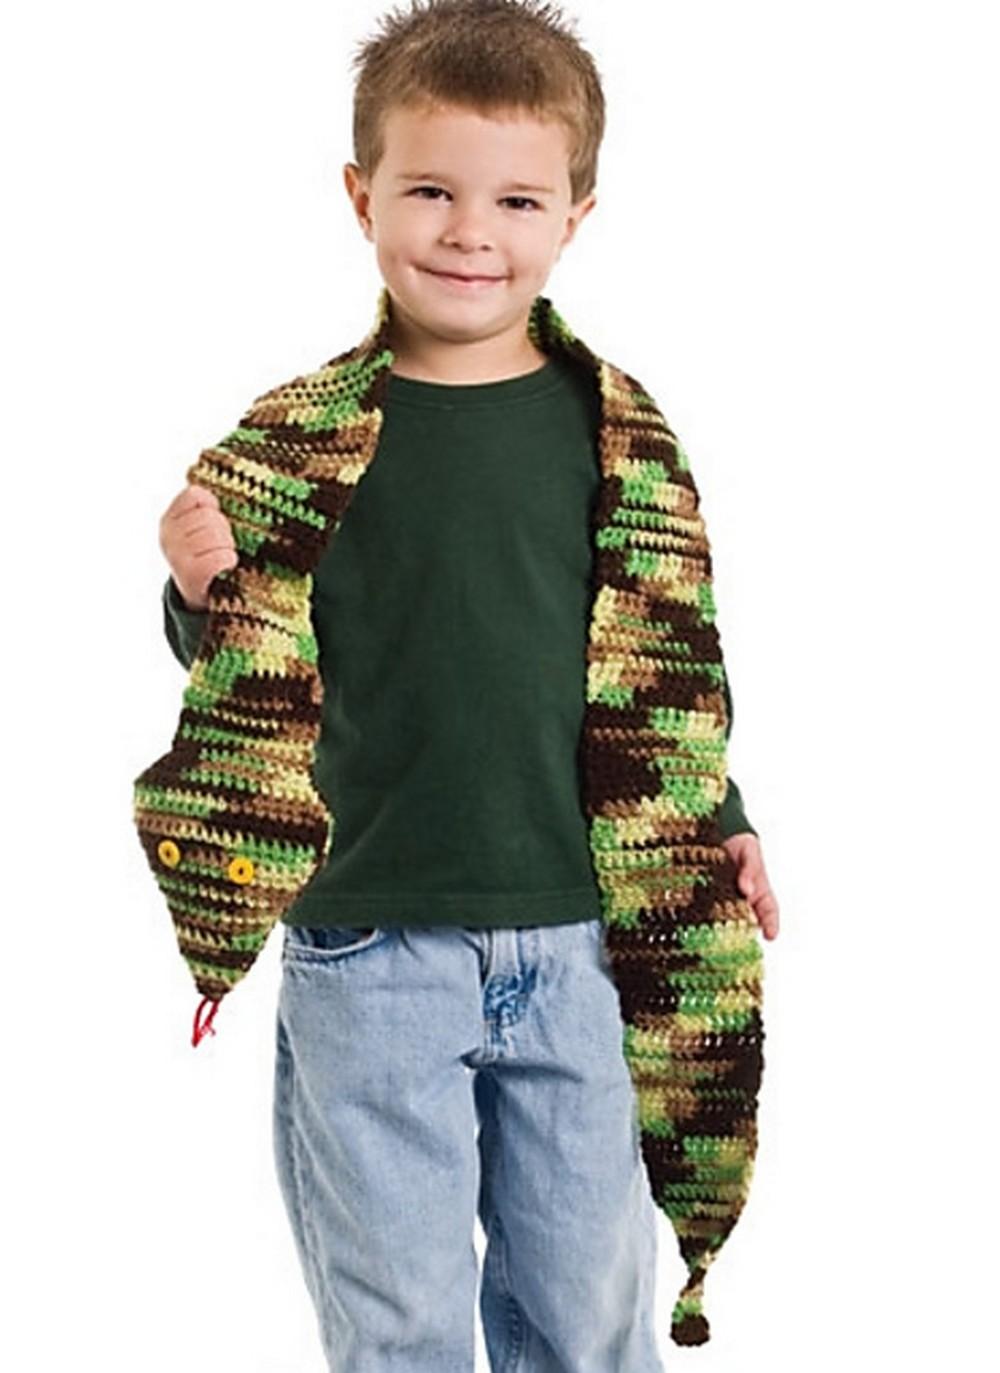 Free Crochet Snakes Alive pattern